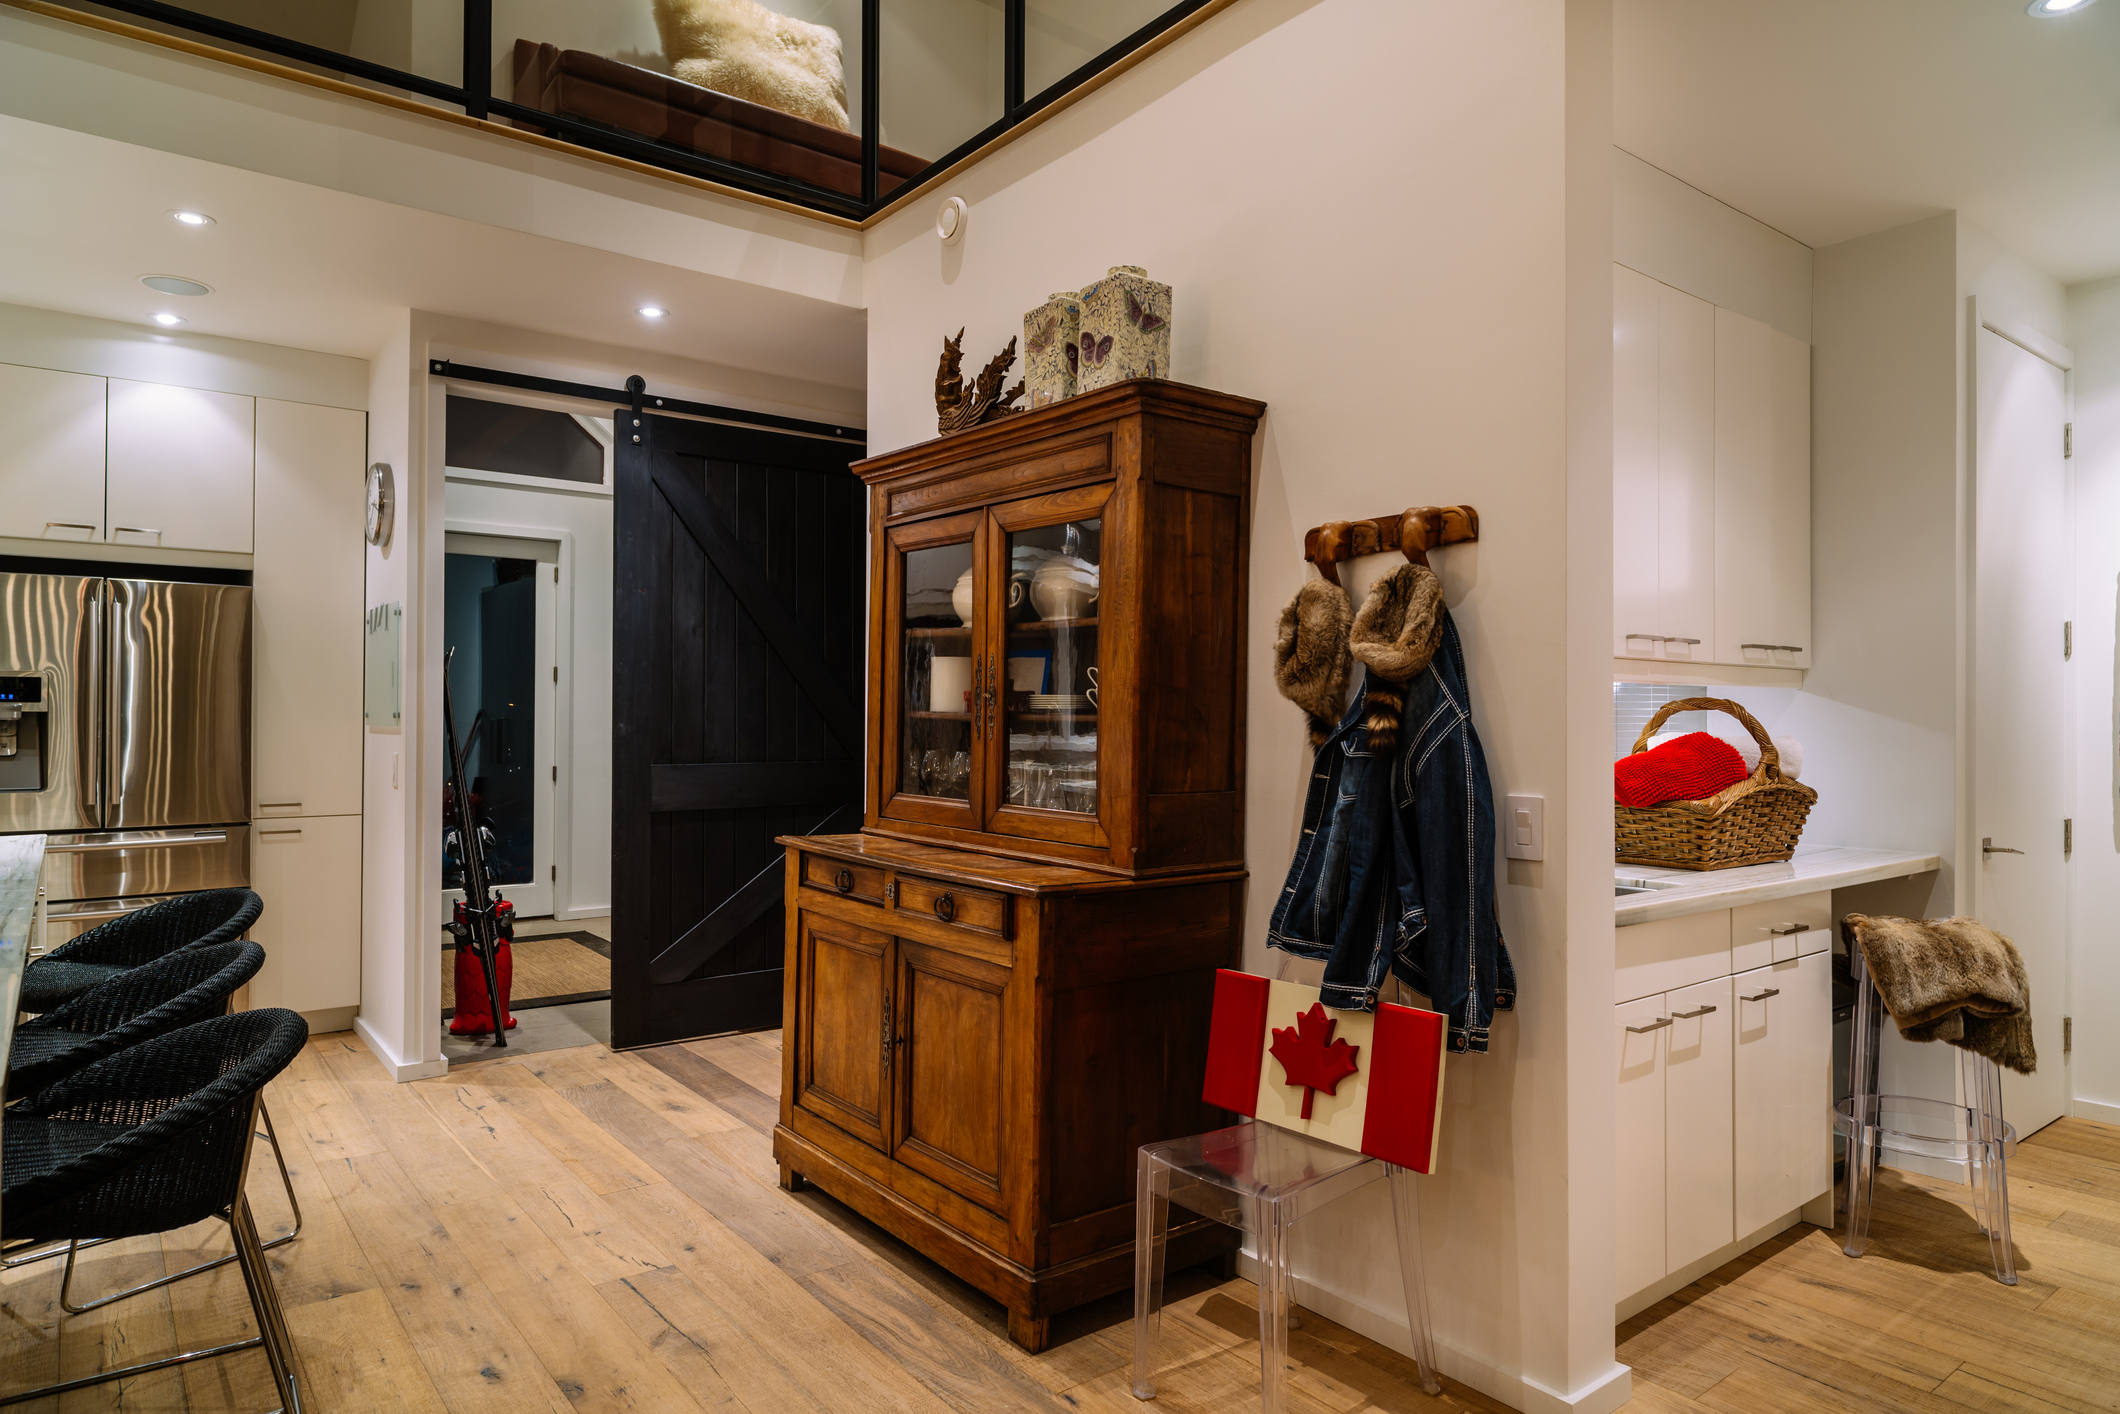 Arredare casa antica xy17 regardsdefemmes for Arredamento casa antica